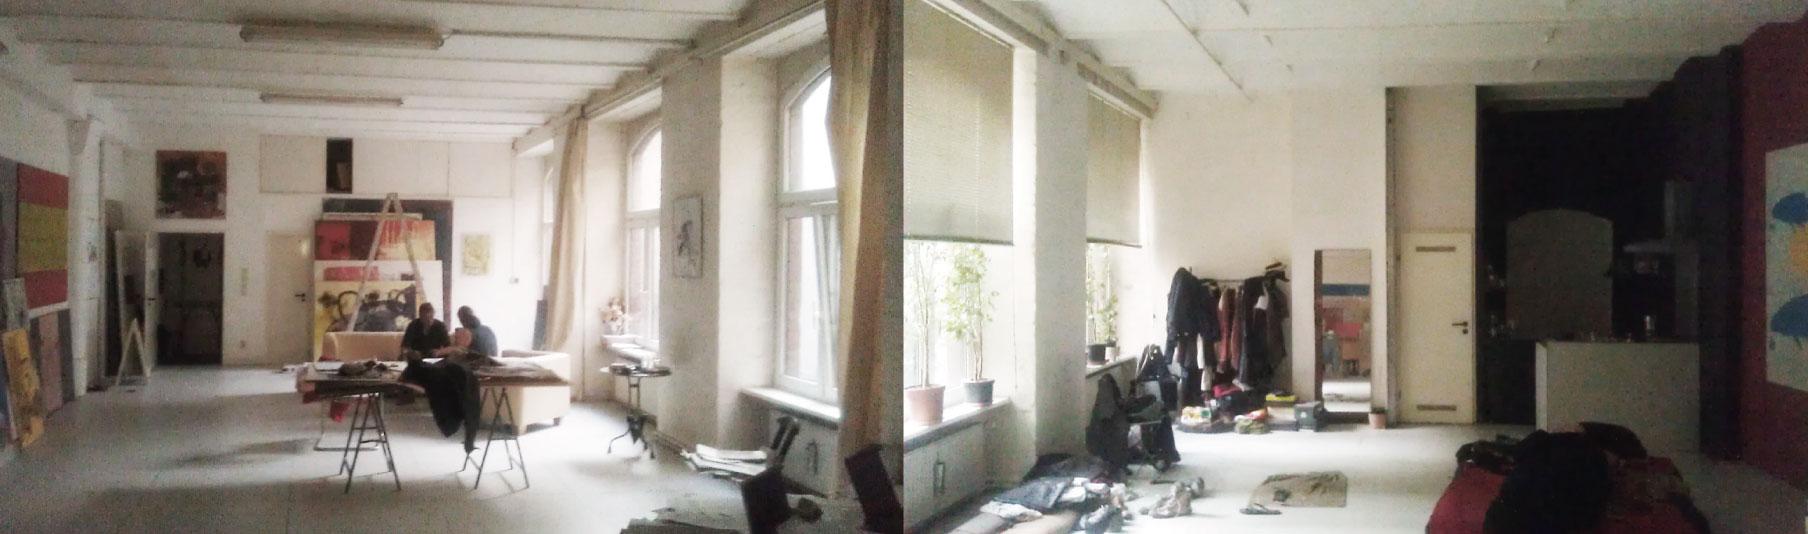 STUDIOKUBIK-KUBIK-architektur-architecture-berlin-umbau-buero-office_vorher5